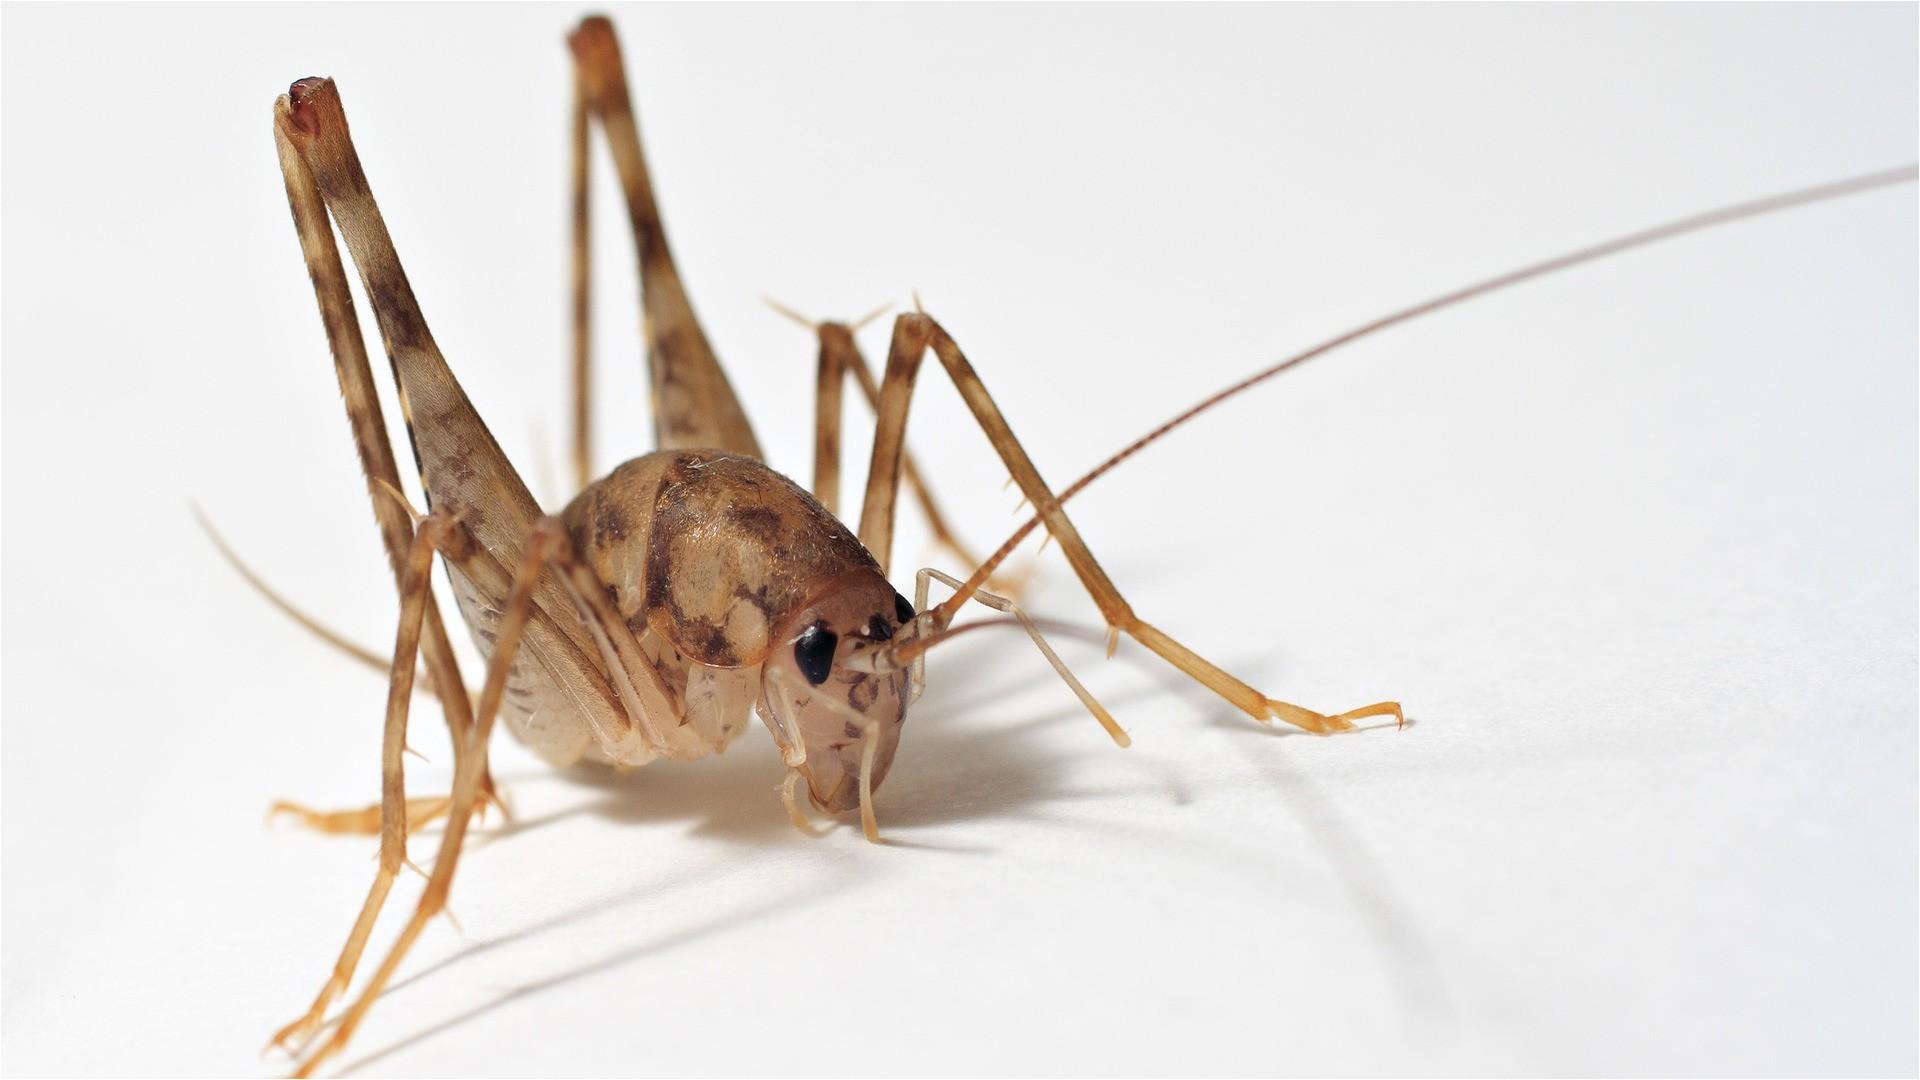 Ozone Pest Control toms River Nj Pest Control Nj Termite Control Ozane Termite Pest Control